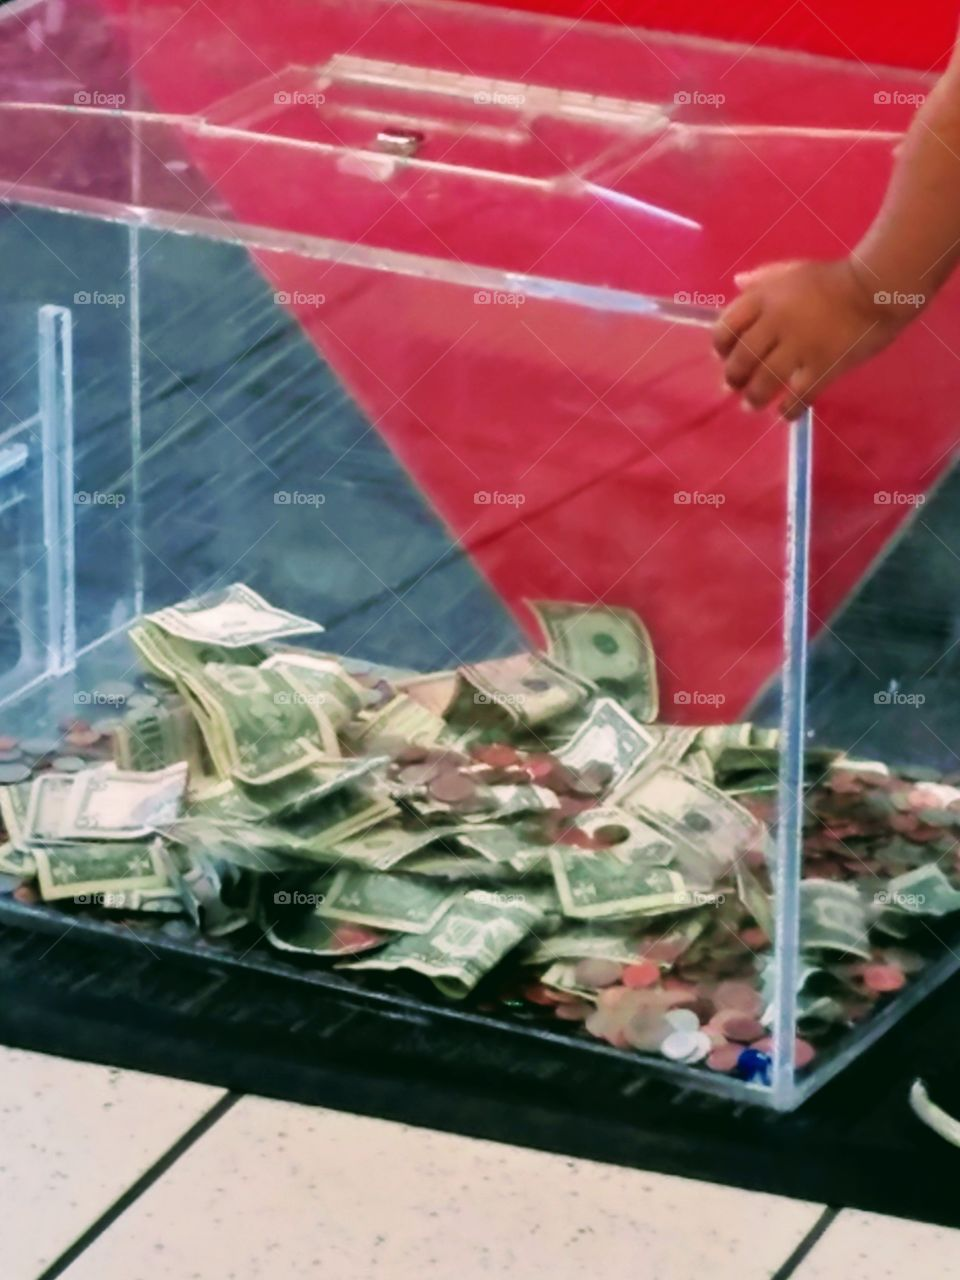 Donation Box With Money